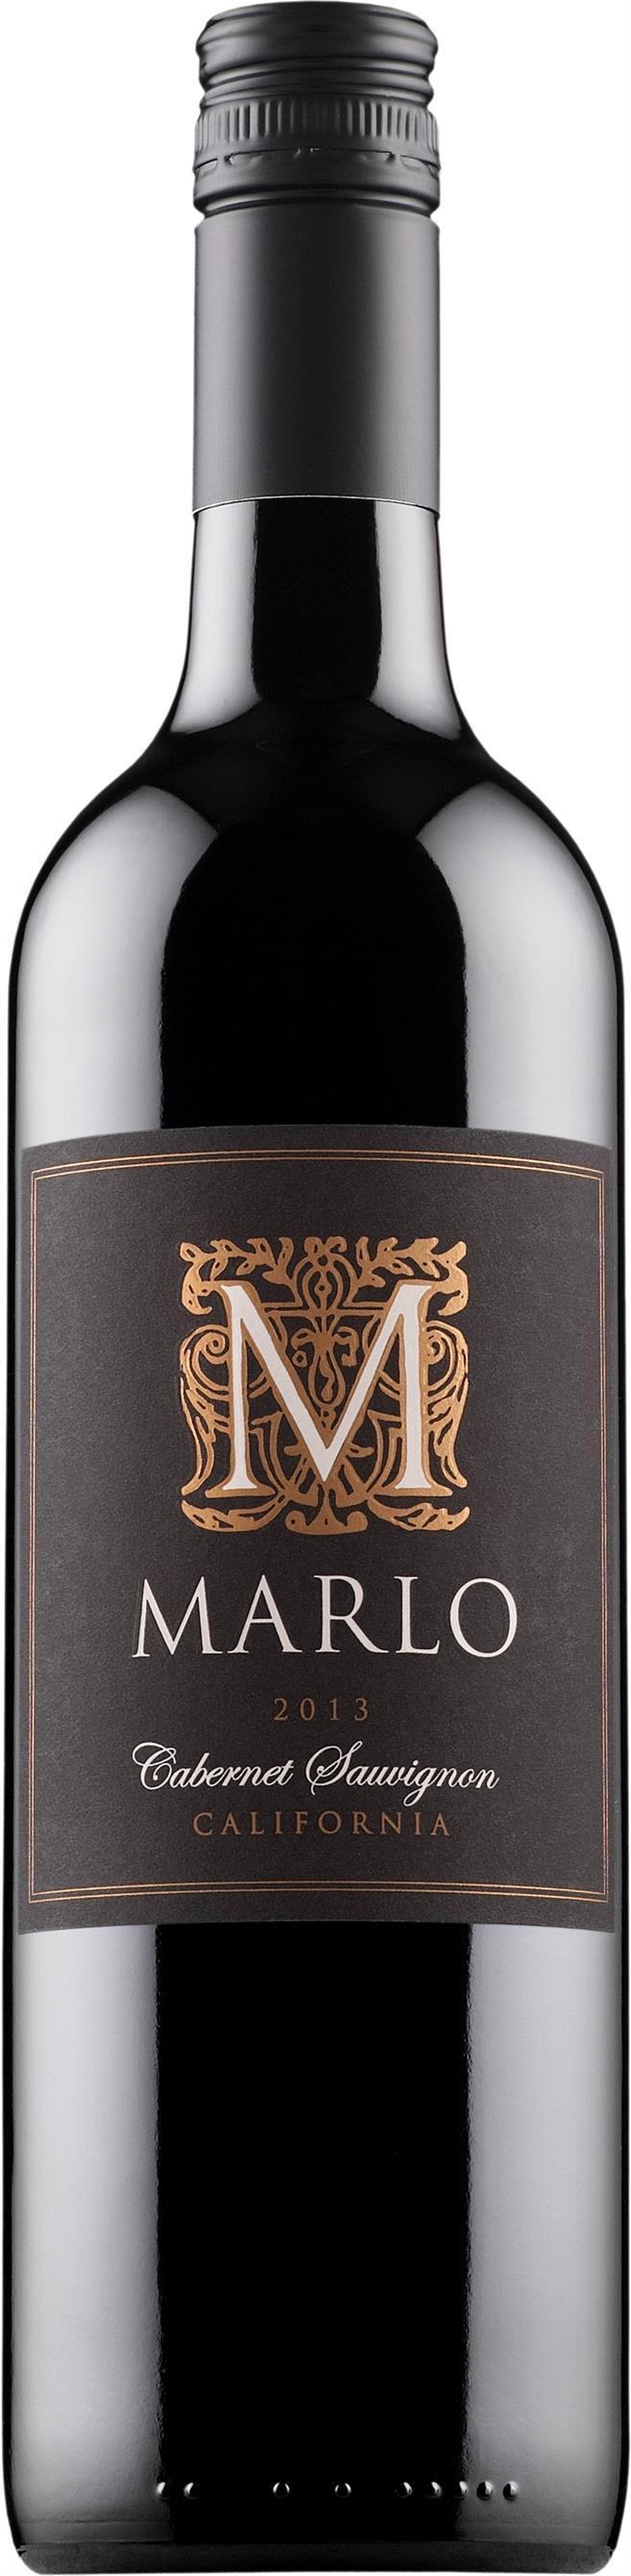 Marlo (Cabernet Sauvignon, Zinfandel, 2013) 9,99€